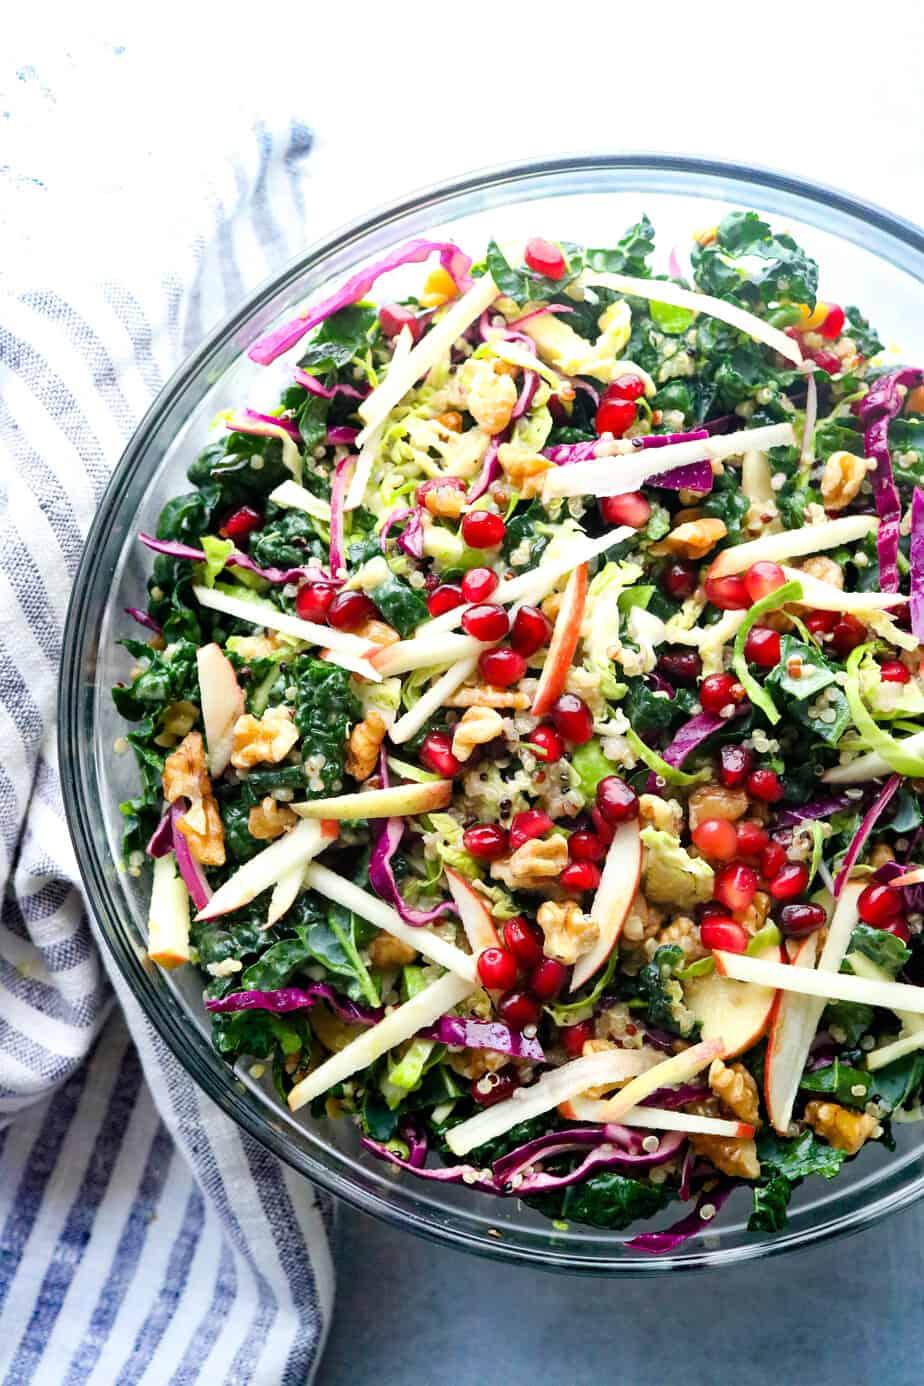 Autumn Chopped Kale Salad With Quinoa Pinch Me Good